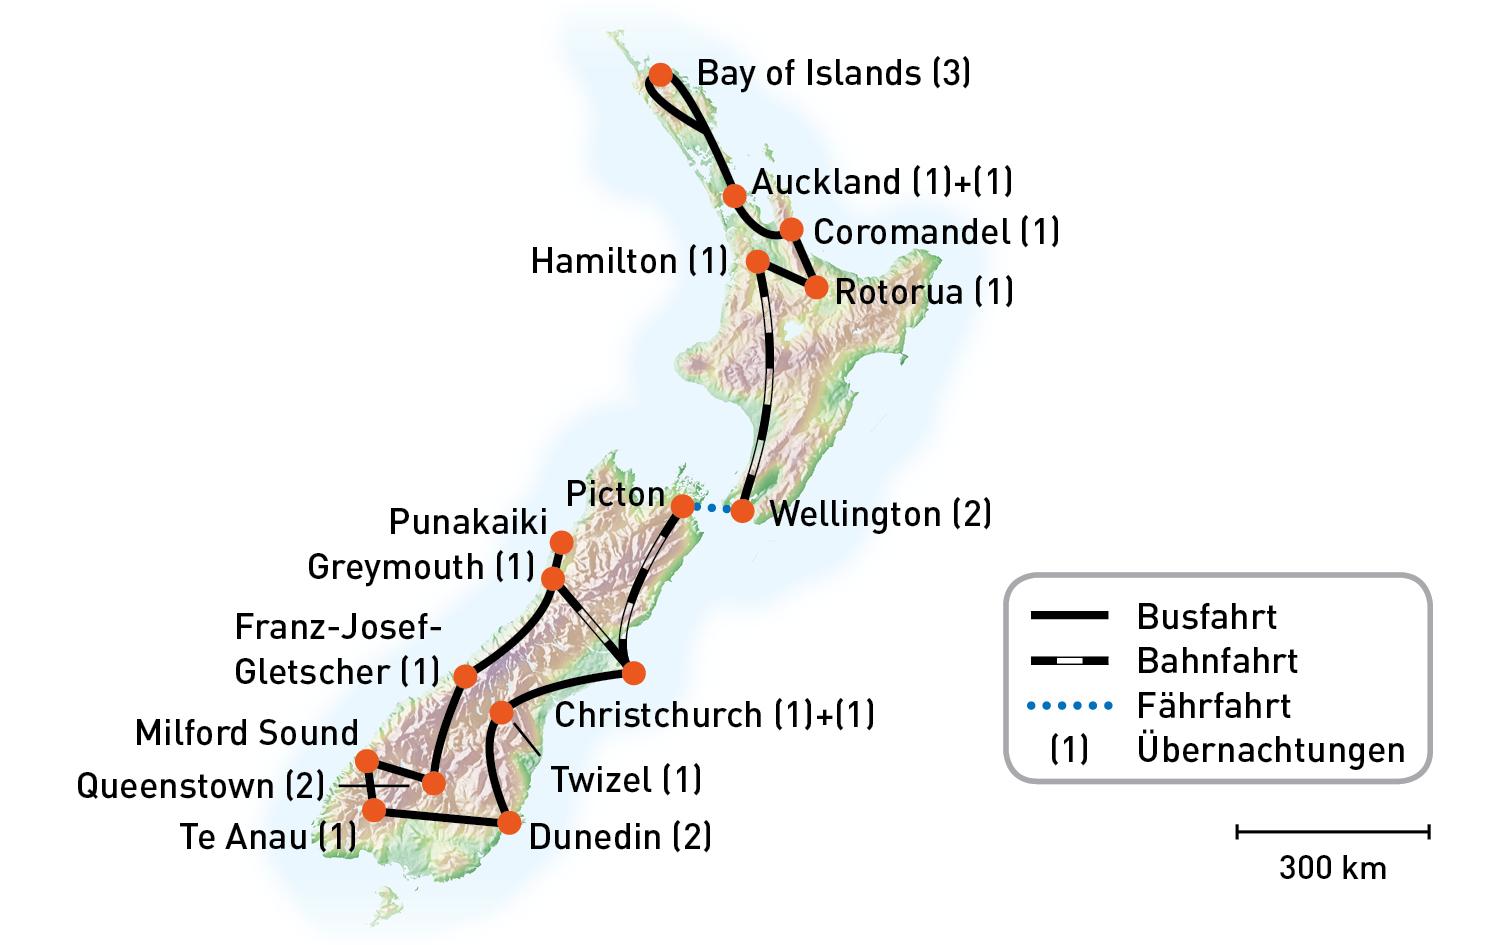 Routenkarte_Neuseeland_Impressionen_Verlaengerung_KiKa2020_RGB